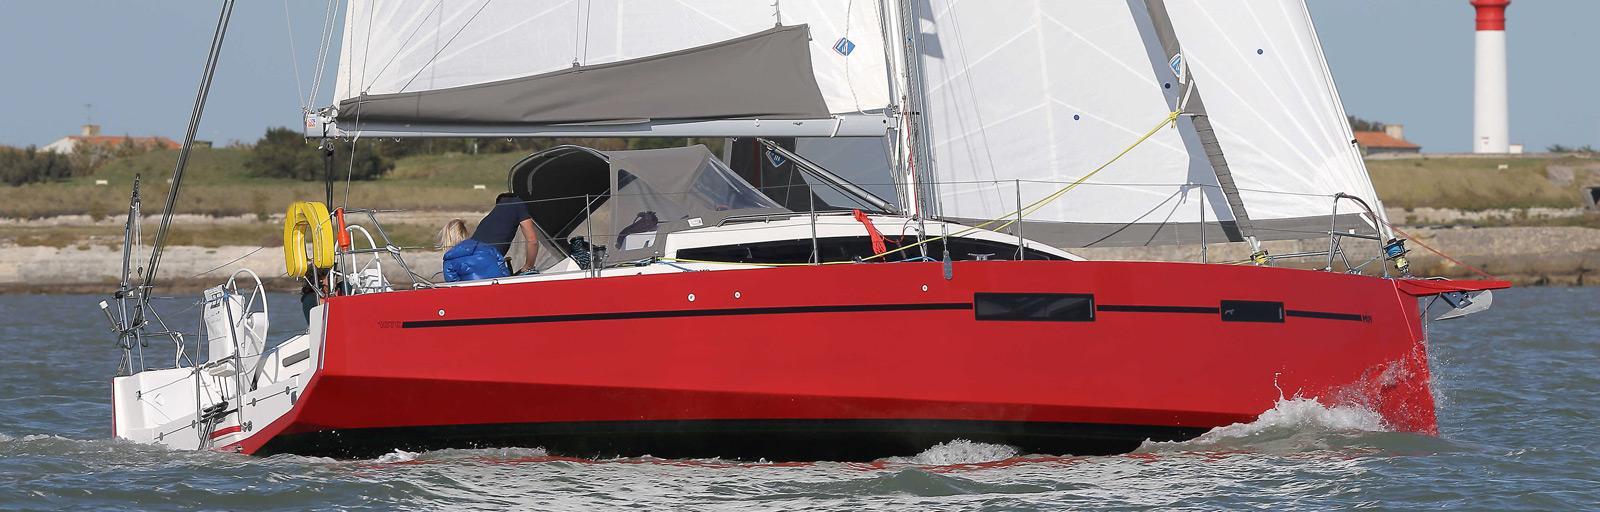 RM 1070 - AYC Yachtbroker